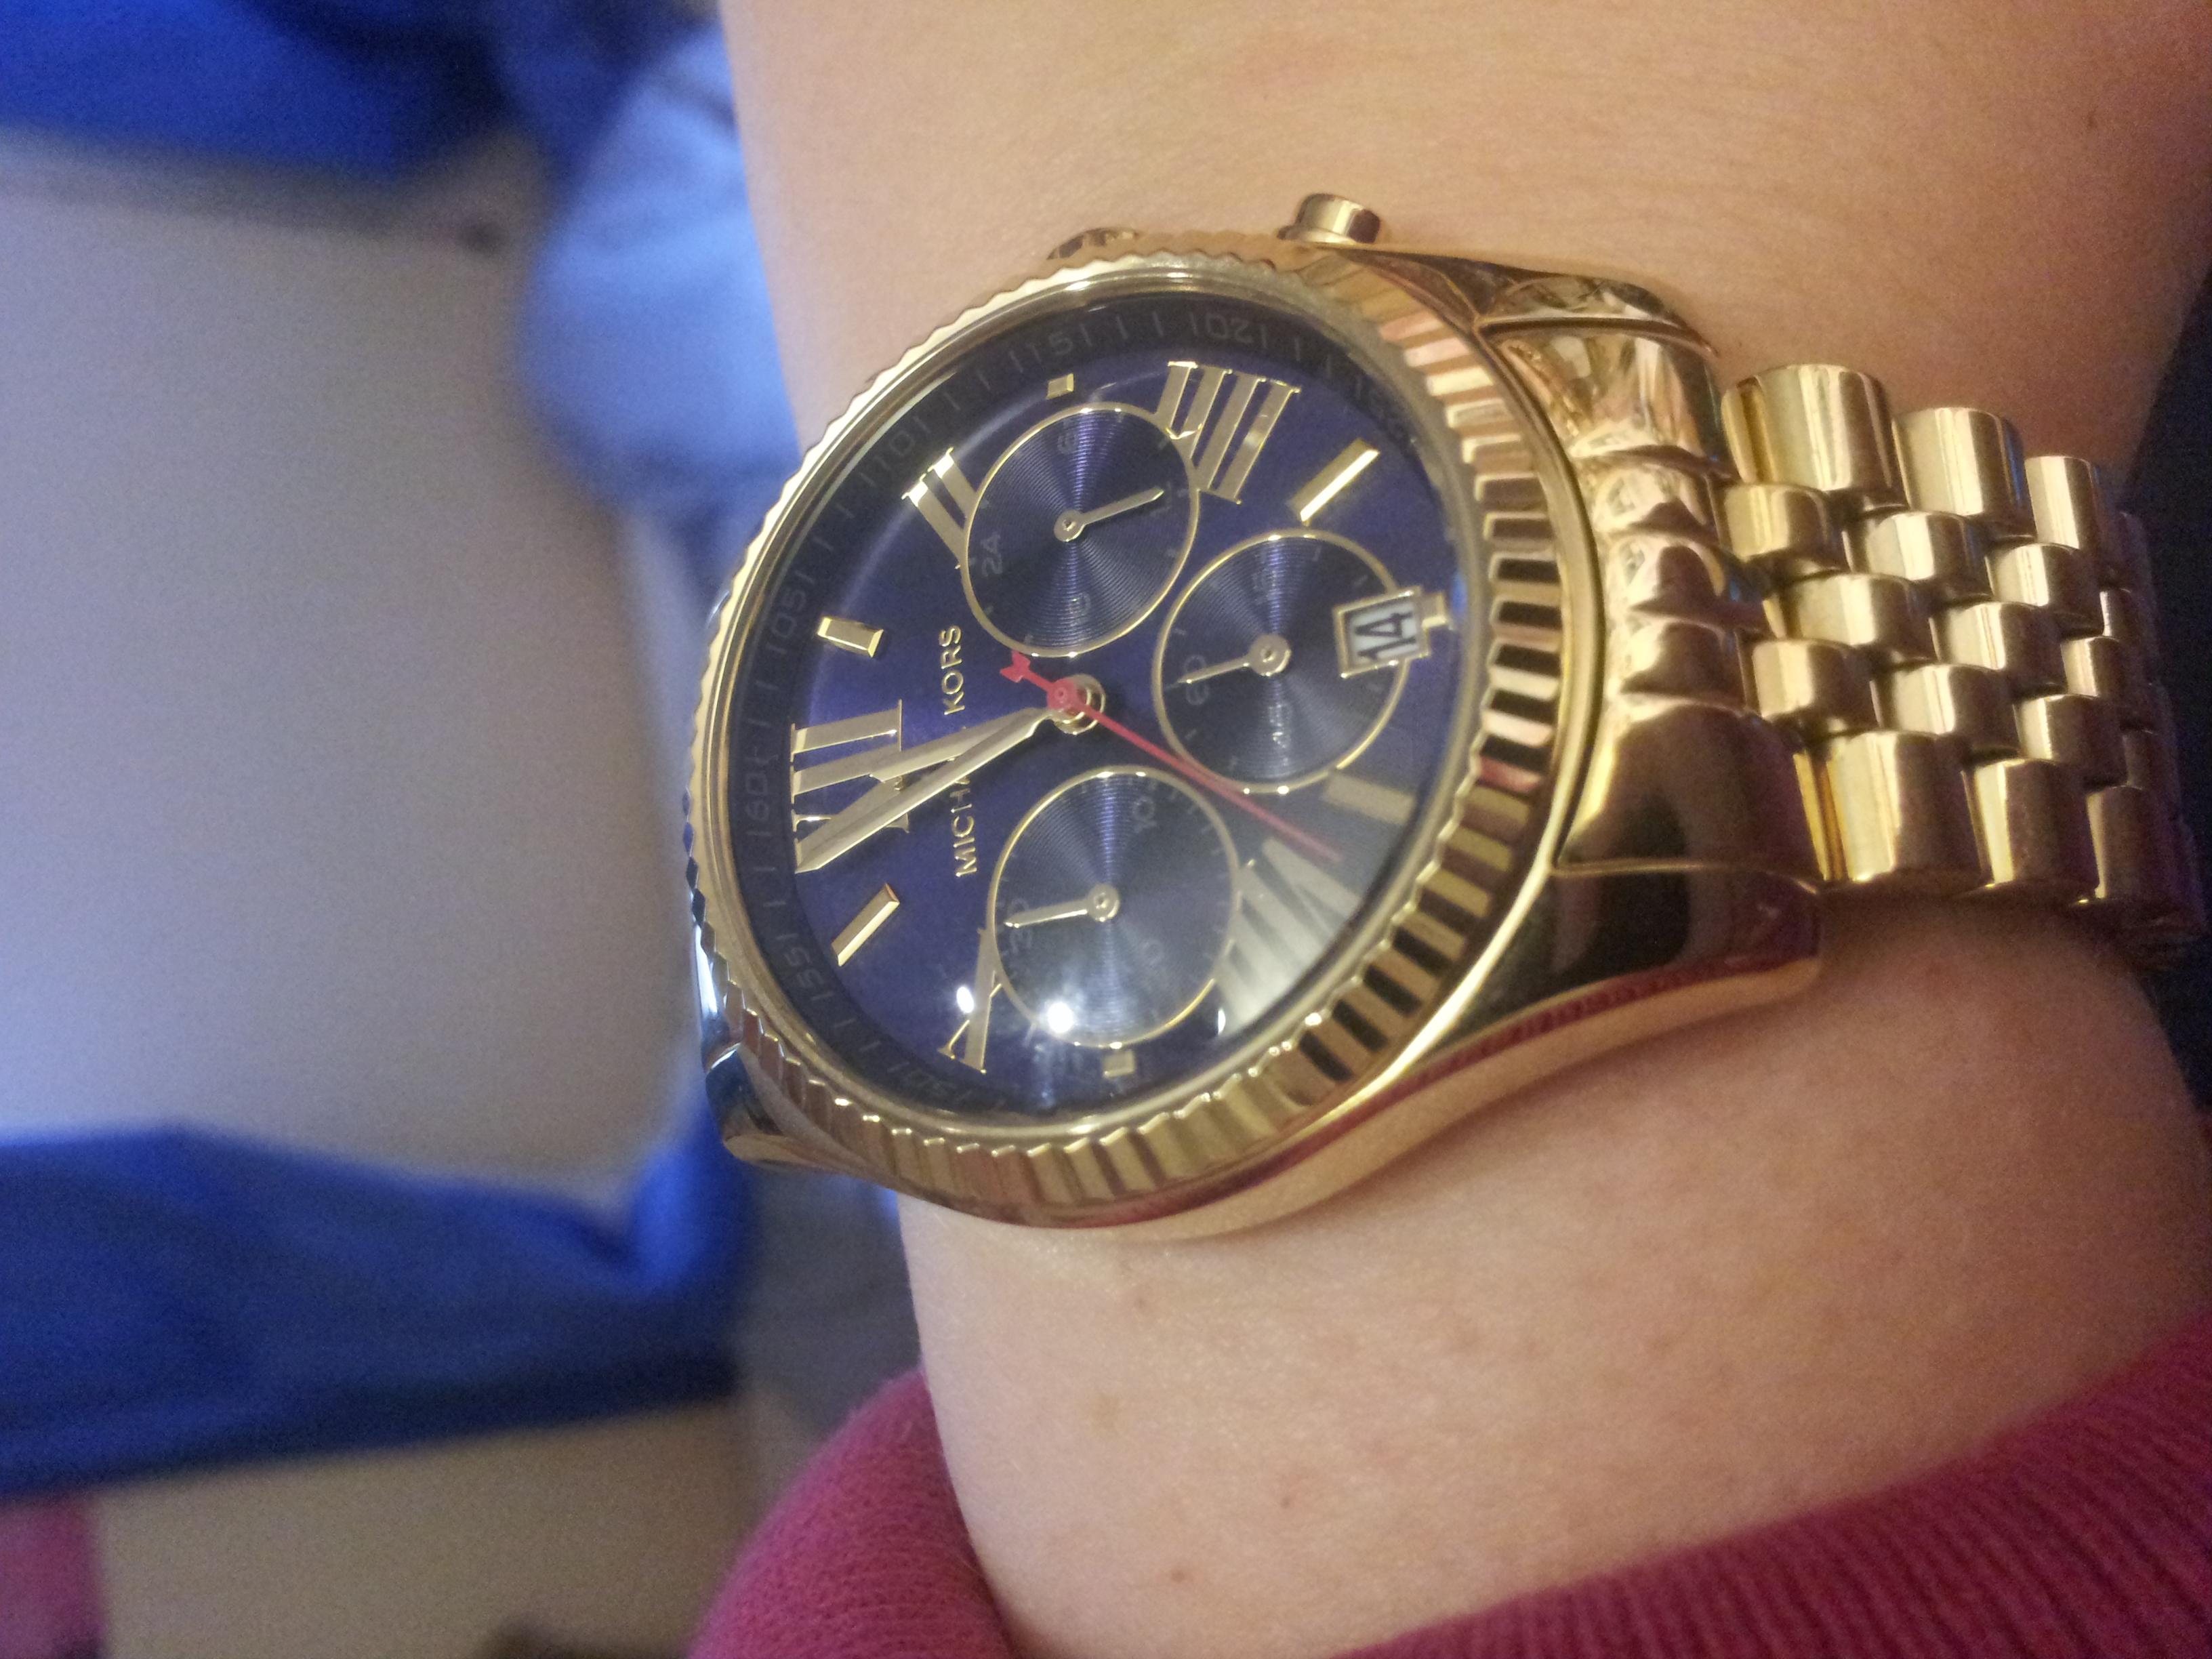 aa2694244d17 Ladies Michael Kors Lexington Chronograph Watch (MK6206)